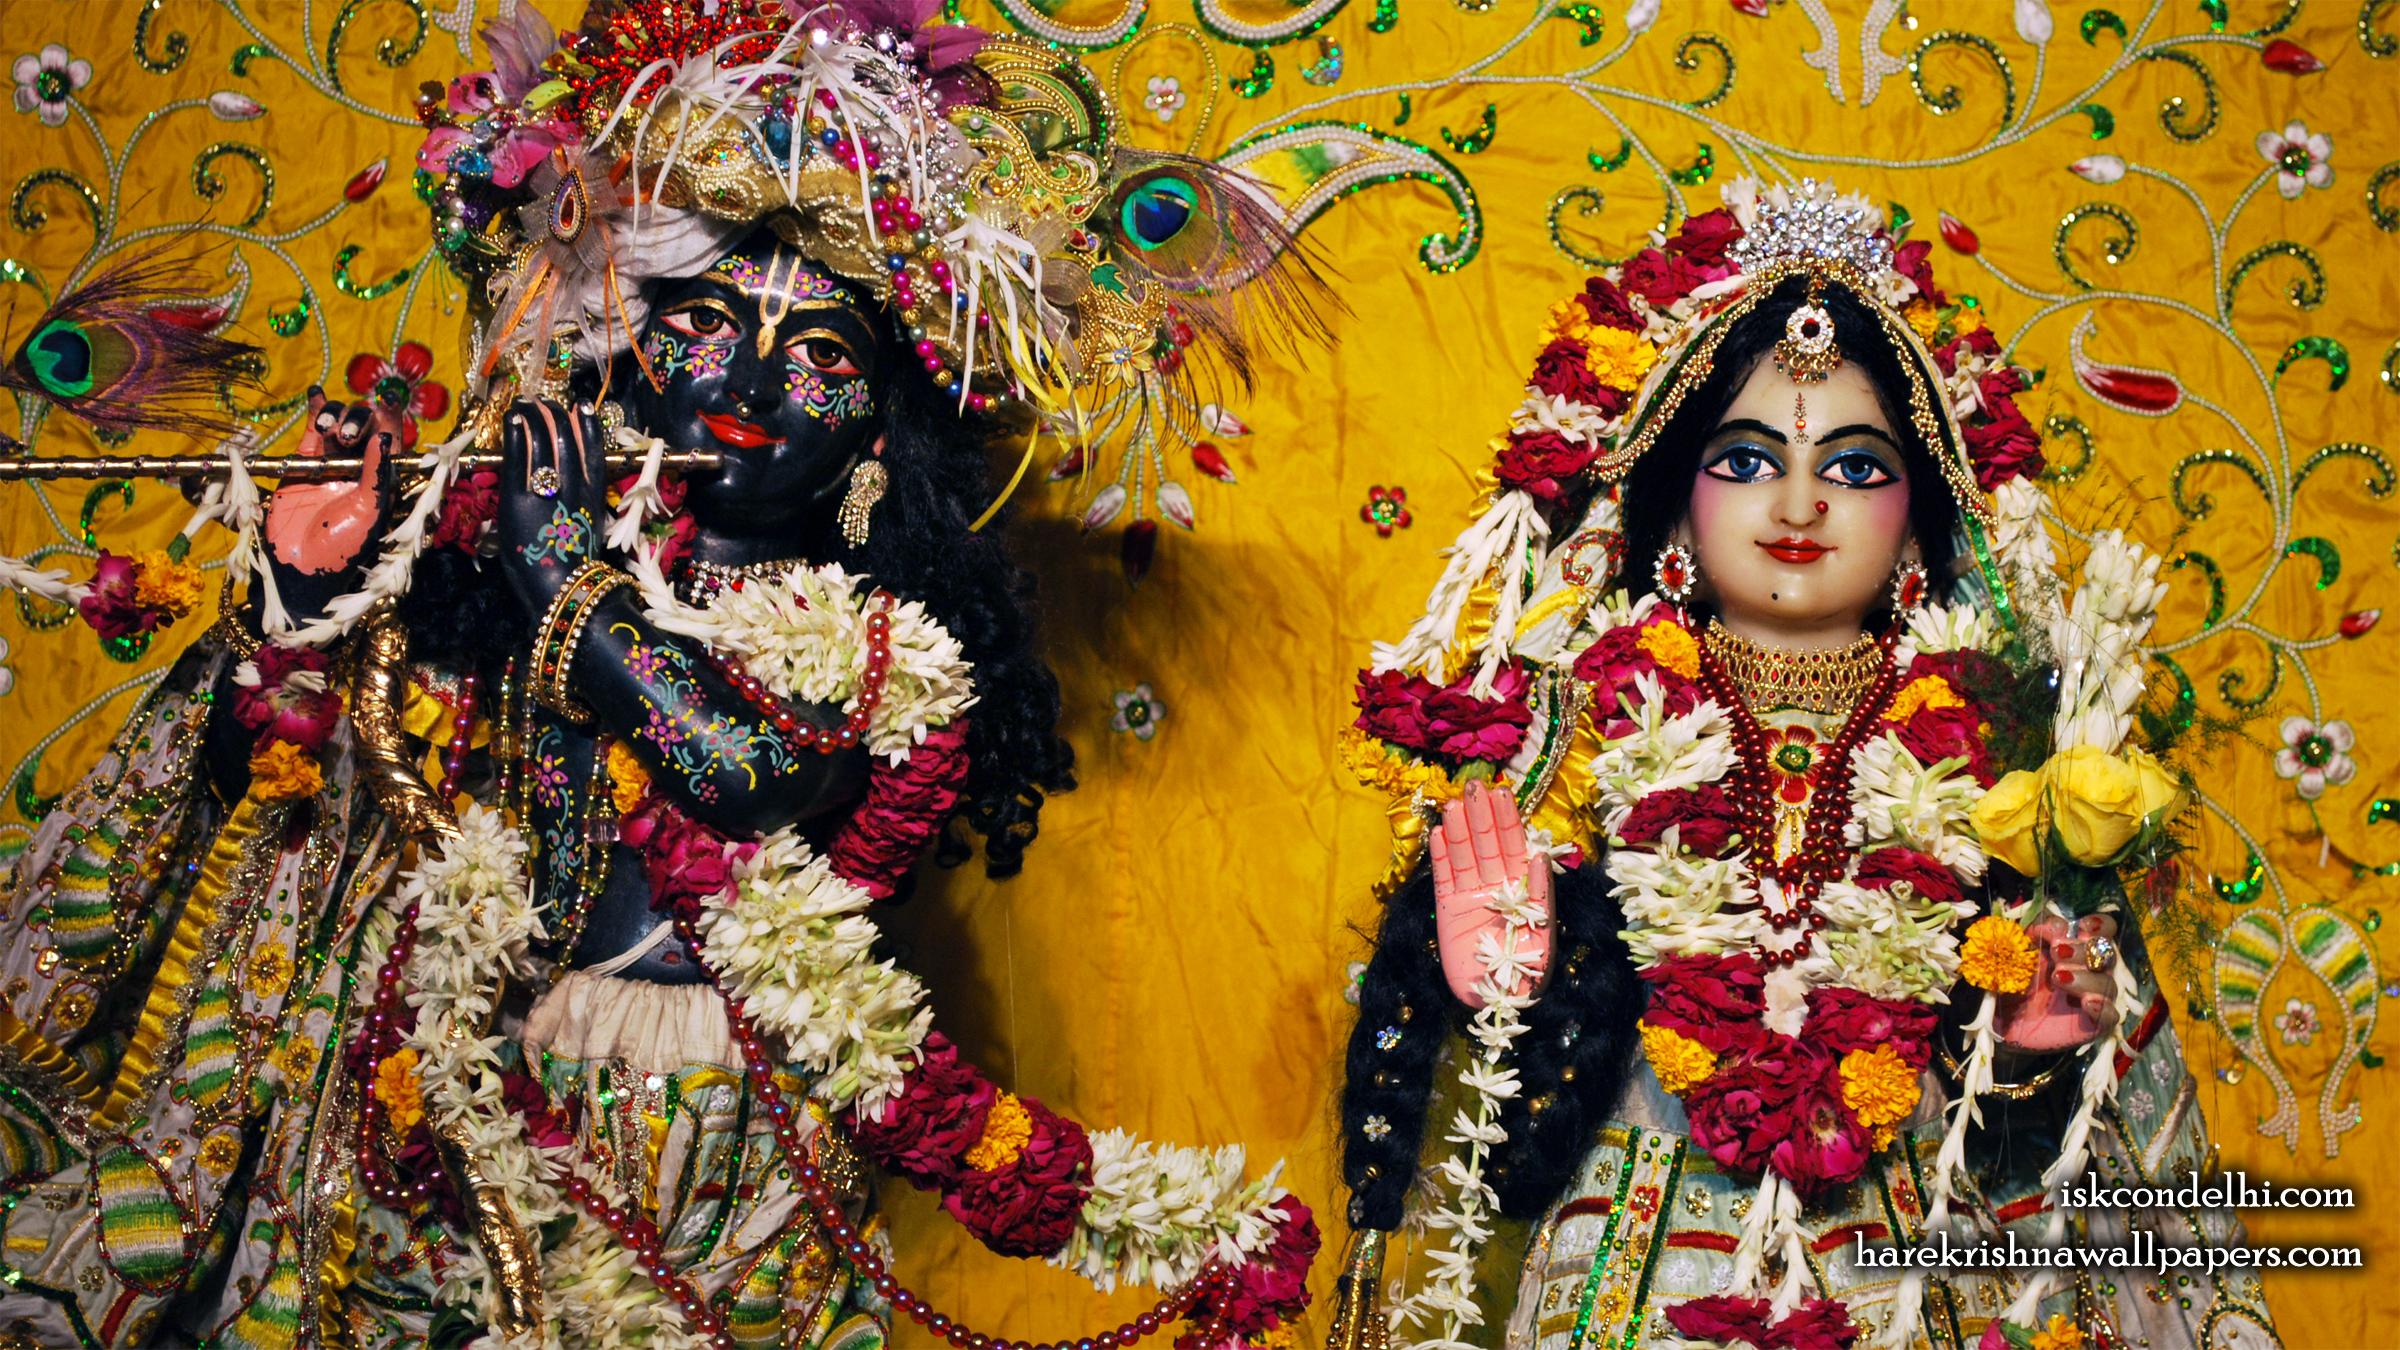 Sri Sri Radha Parthasarathi Close up Wallpaper (010) Size 2400x1350 Download